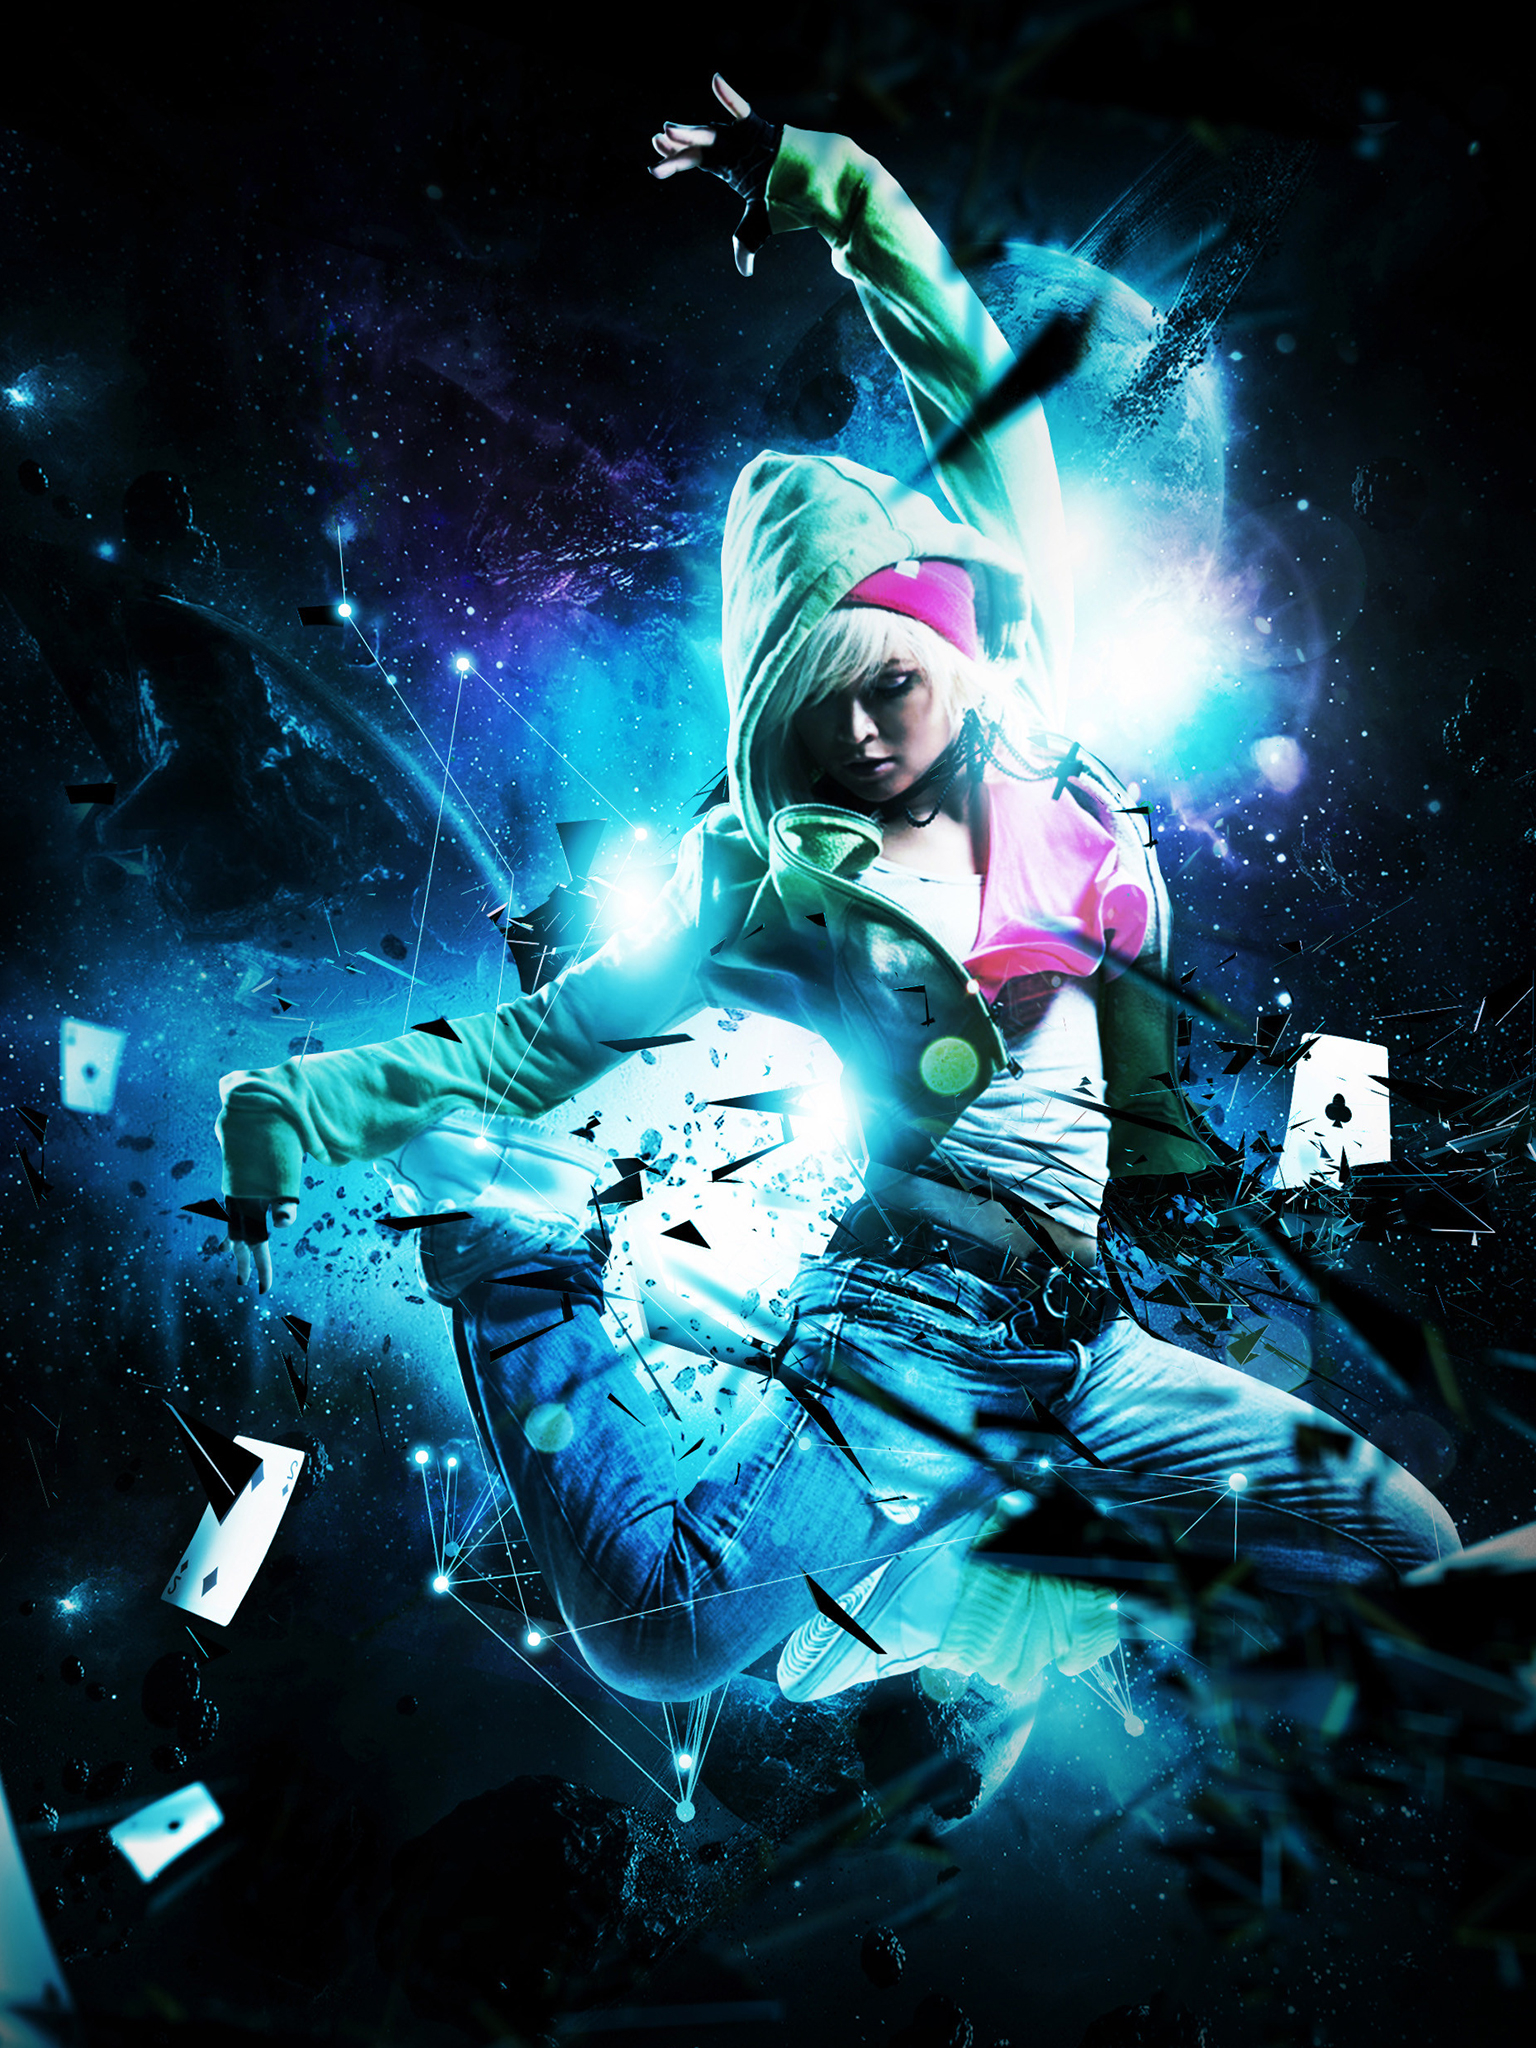 Free Download Wallpaper Hd Iphone Hip Hop Dance Blue Light Ipad Retina 2048x2048 For Your Desktop Mobile Tablet Explore 76 Hip Hop Dance Wallpaper Hip Hop Dance Backgrounds Hip